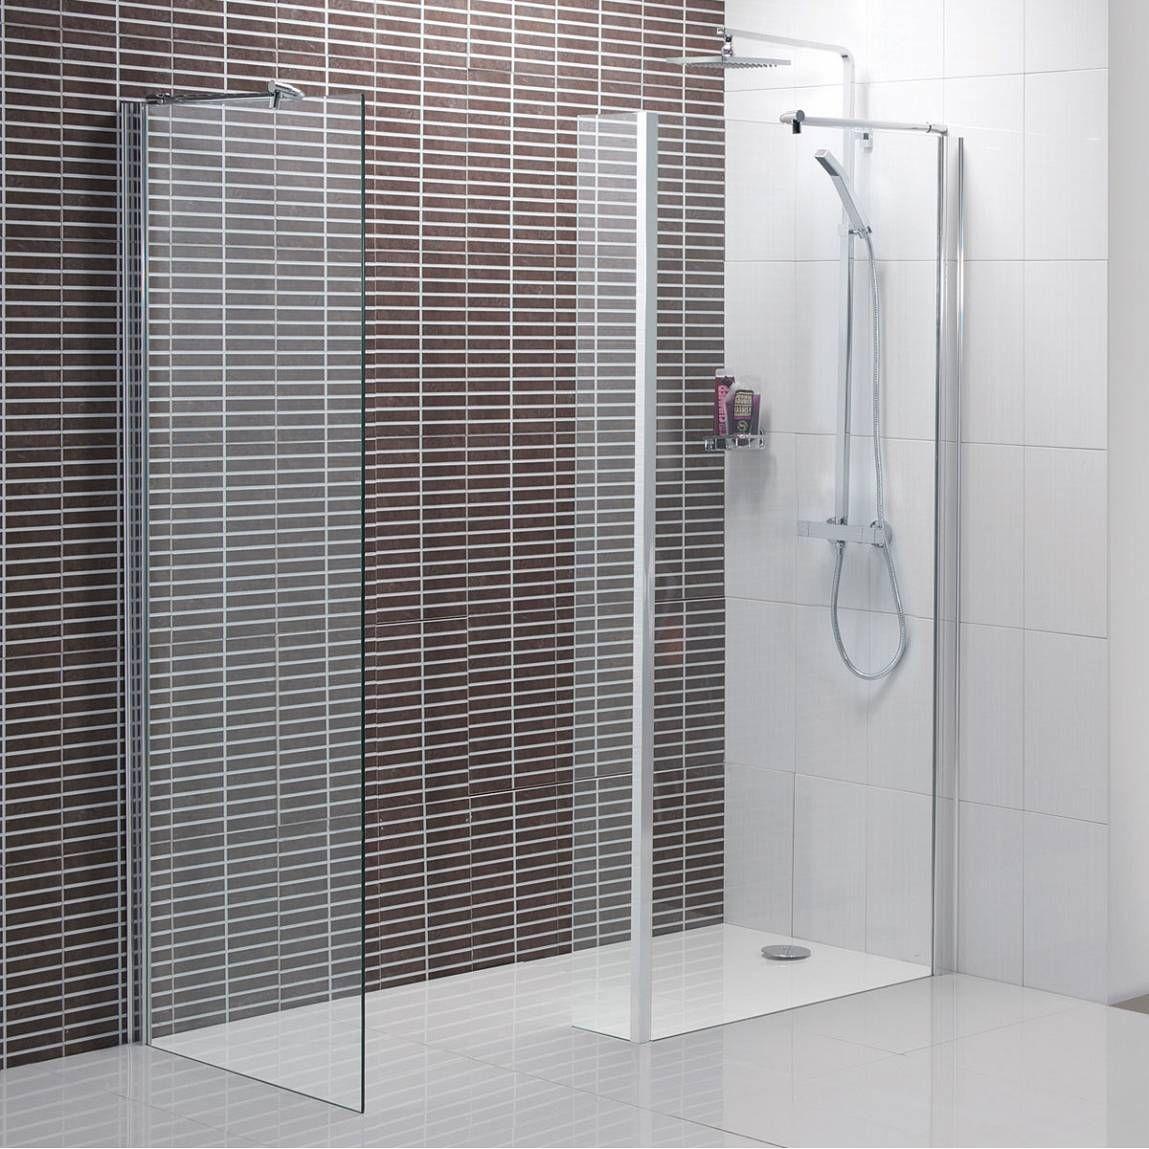 Victoriaplum Com The Uk S Leading Online Bathroom Retailer Walk In Shower Enclosures Minimalist Bathroom Design Shower Enclosure